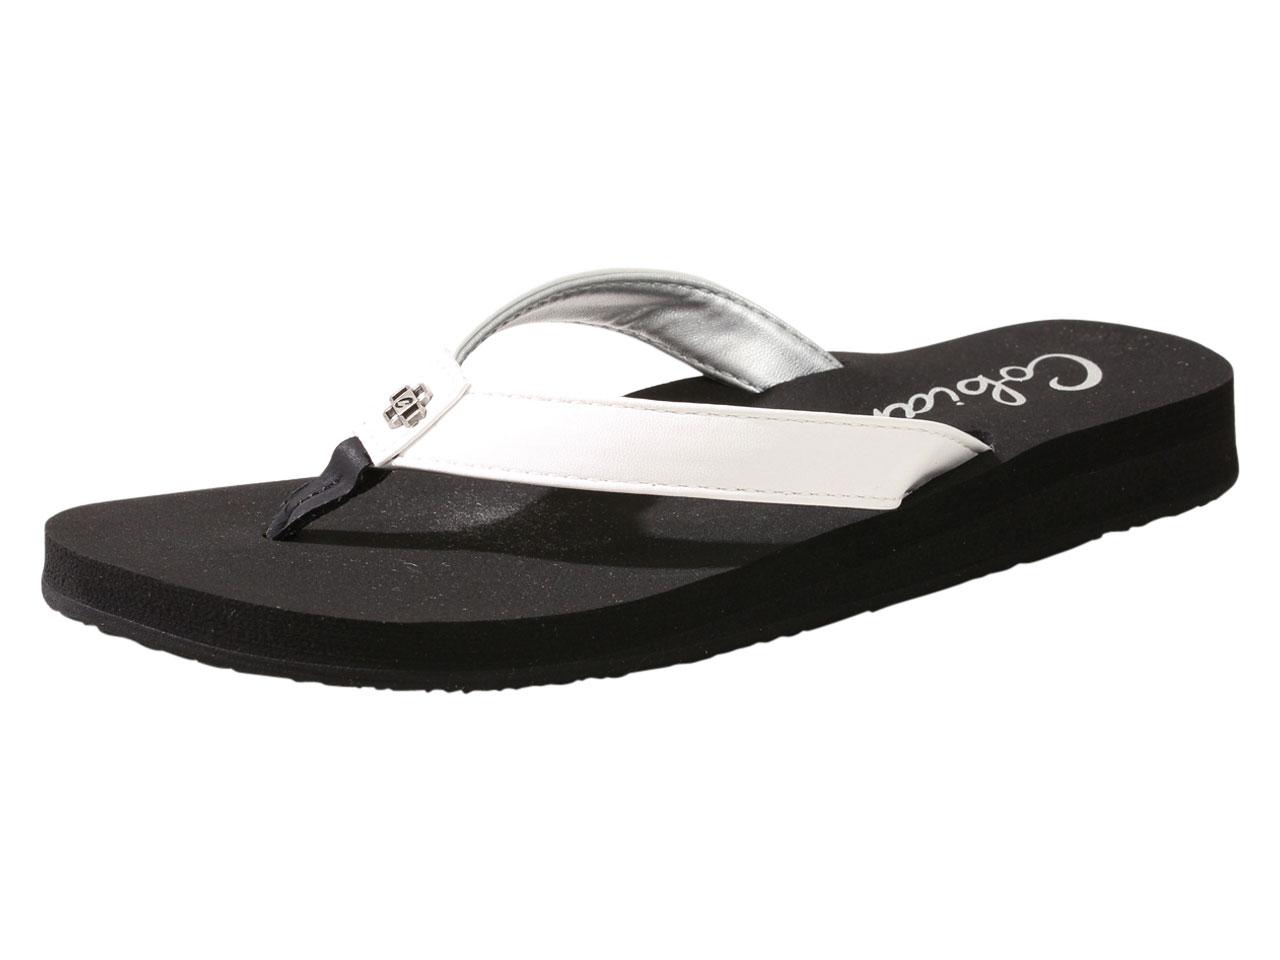 3b6a2700e Cobian Women s Skinny Bounce Flip Flops Sandals Shoes